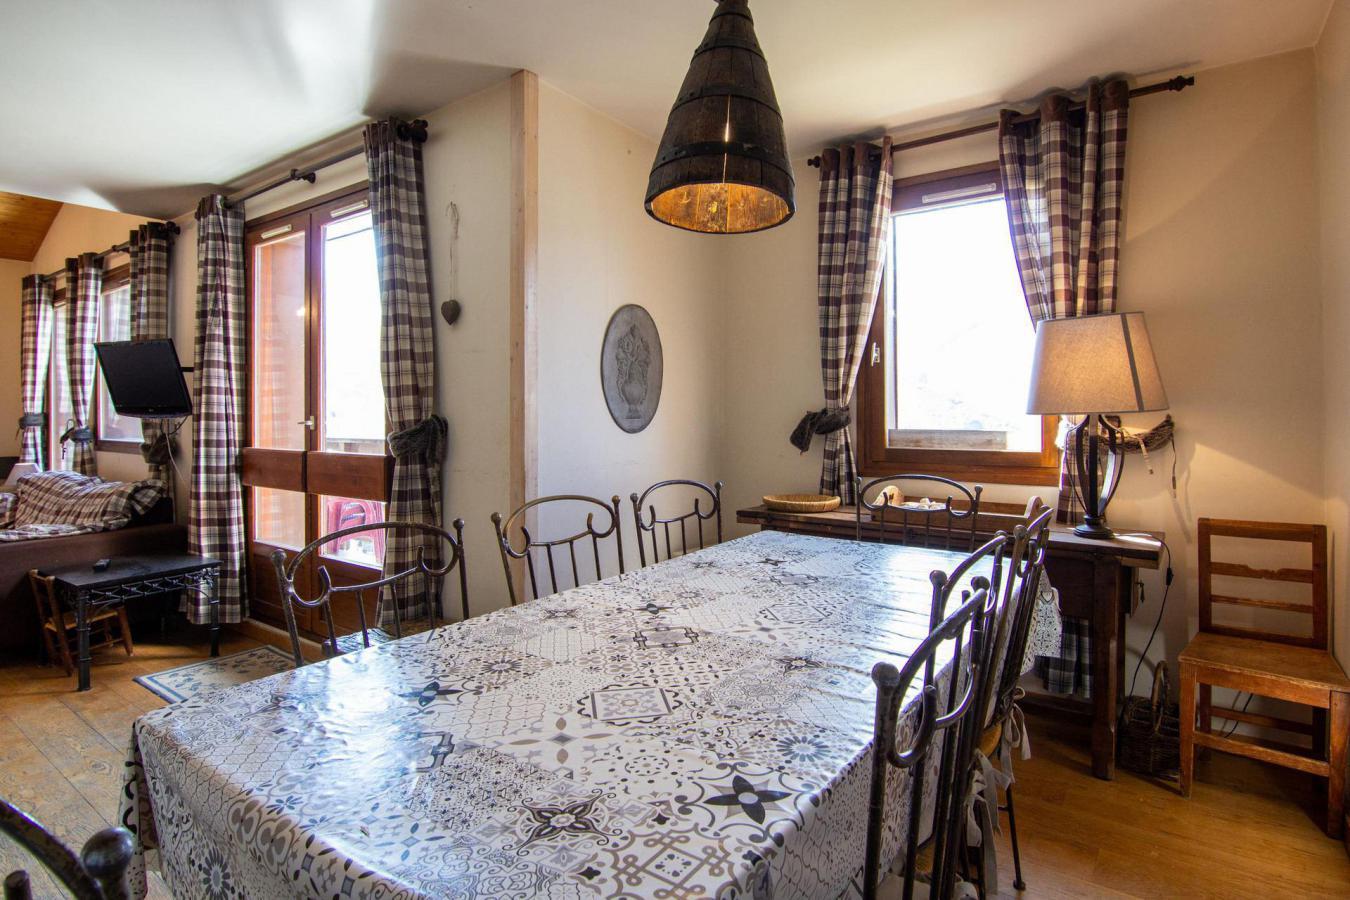 Location au ski Appartement duplex 4 pièces 8 personnes (97) - Residence Reine Blanche - Val Thorens - Plan